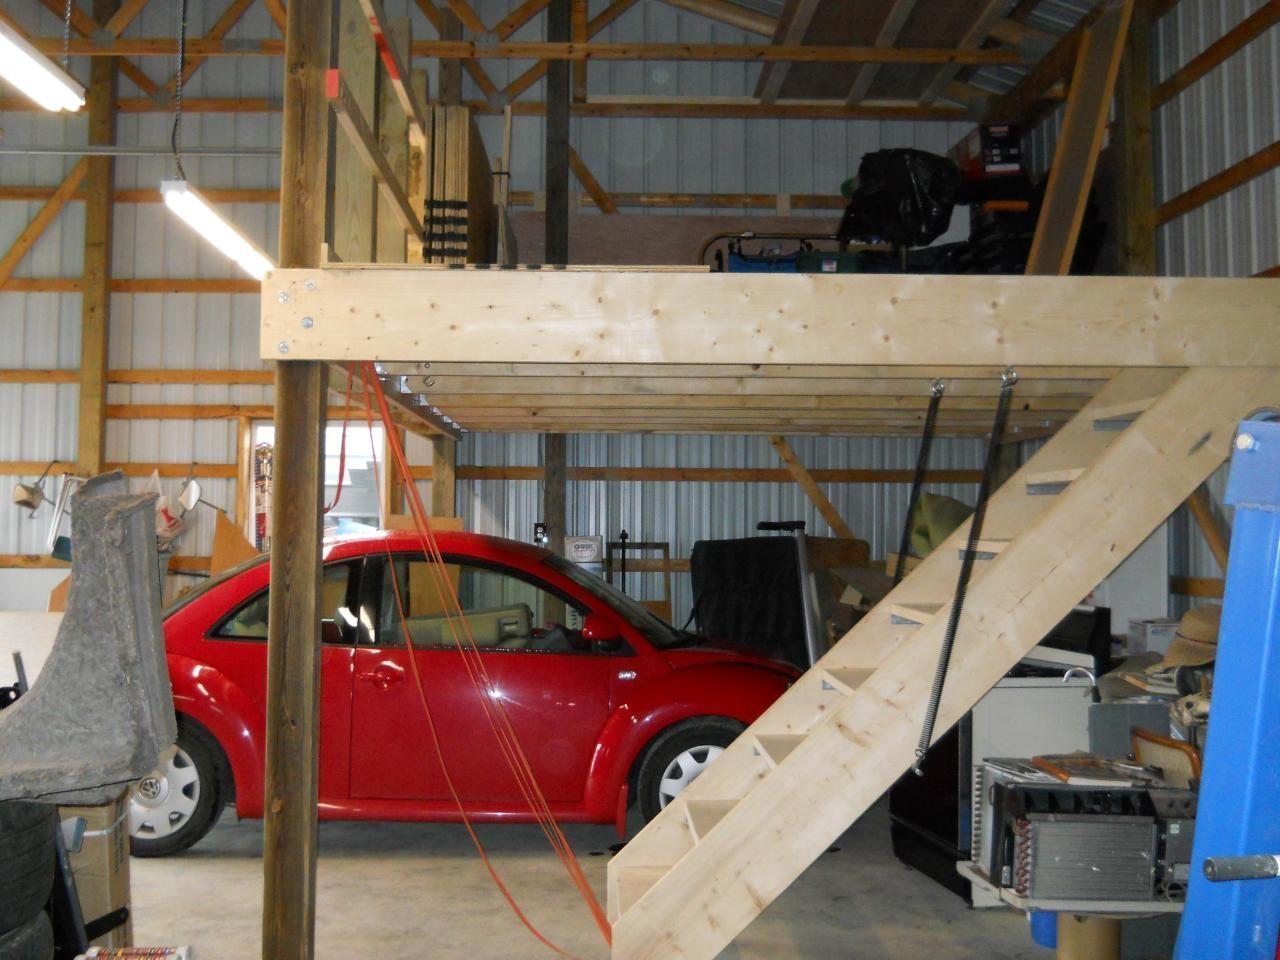 Retro Garage Decor Ford Garage Decor Hot Rod Garage Banners Garage Attic Garage Loft Attic Rooms